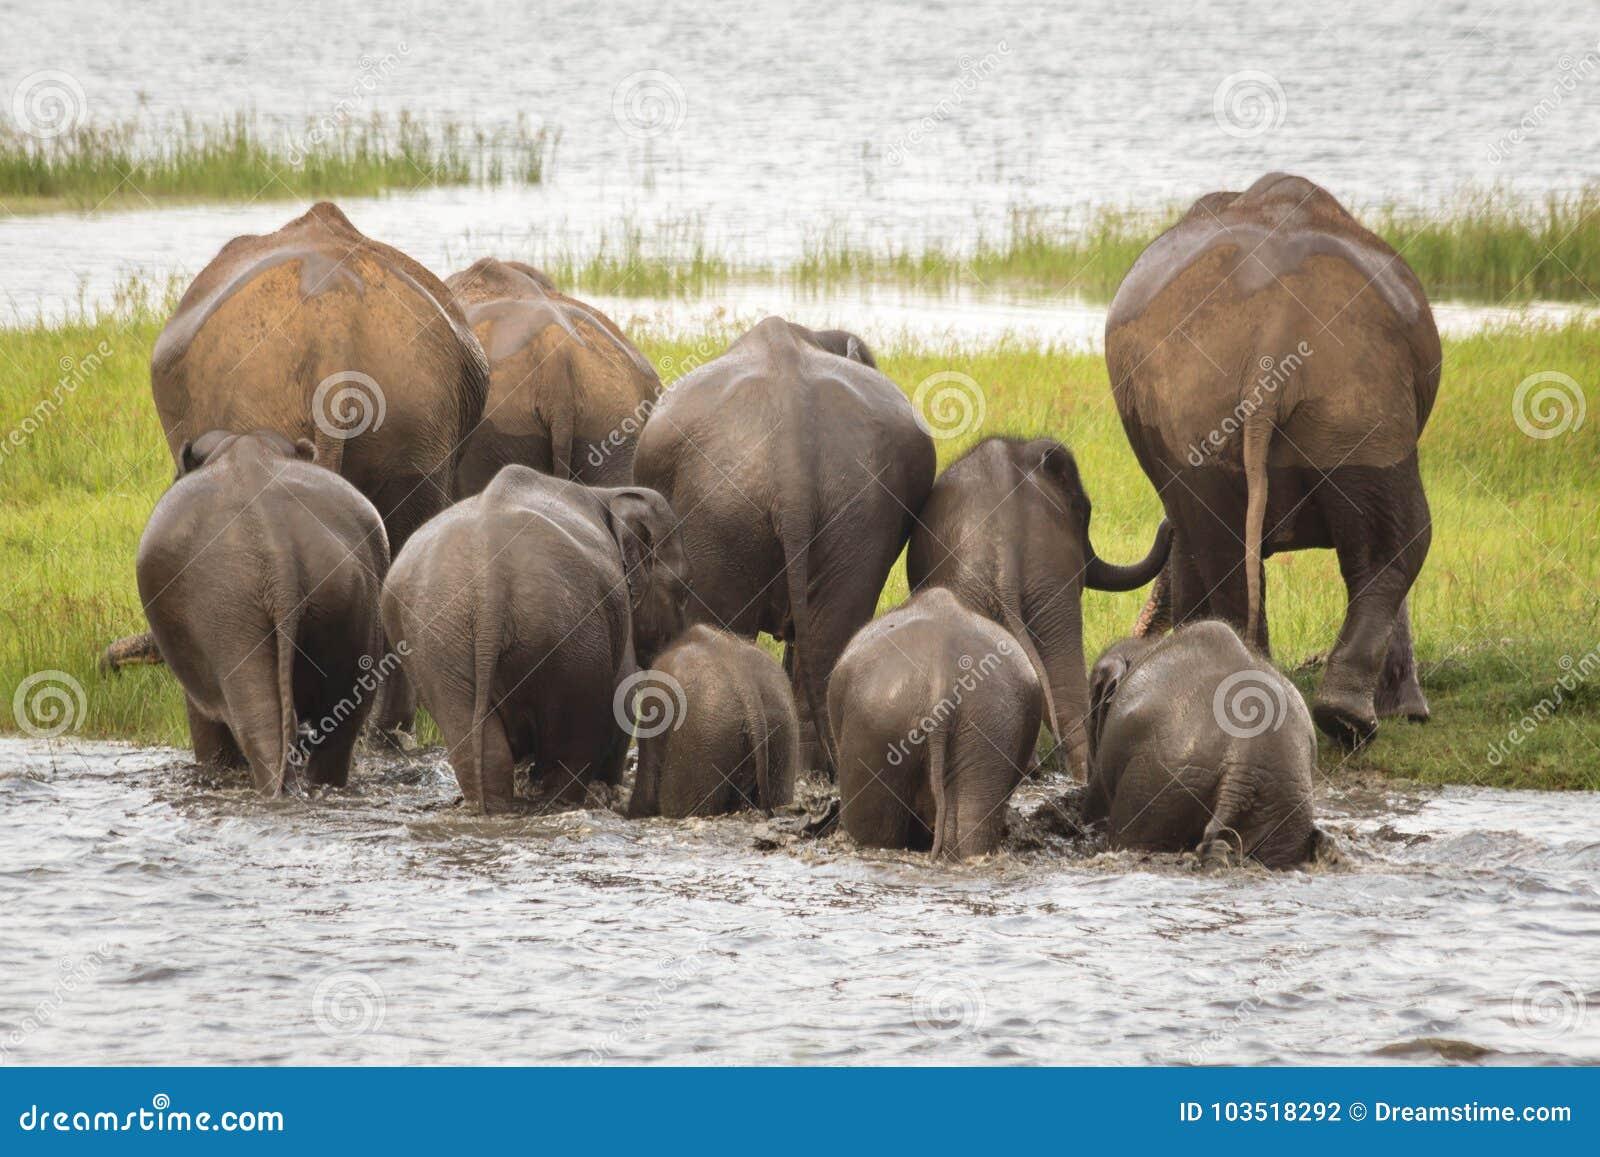 Elephant herd bathing at Minneriya National Park, Sri Lanka